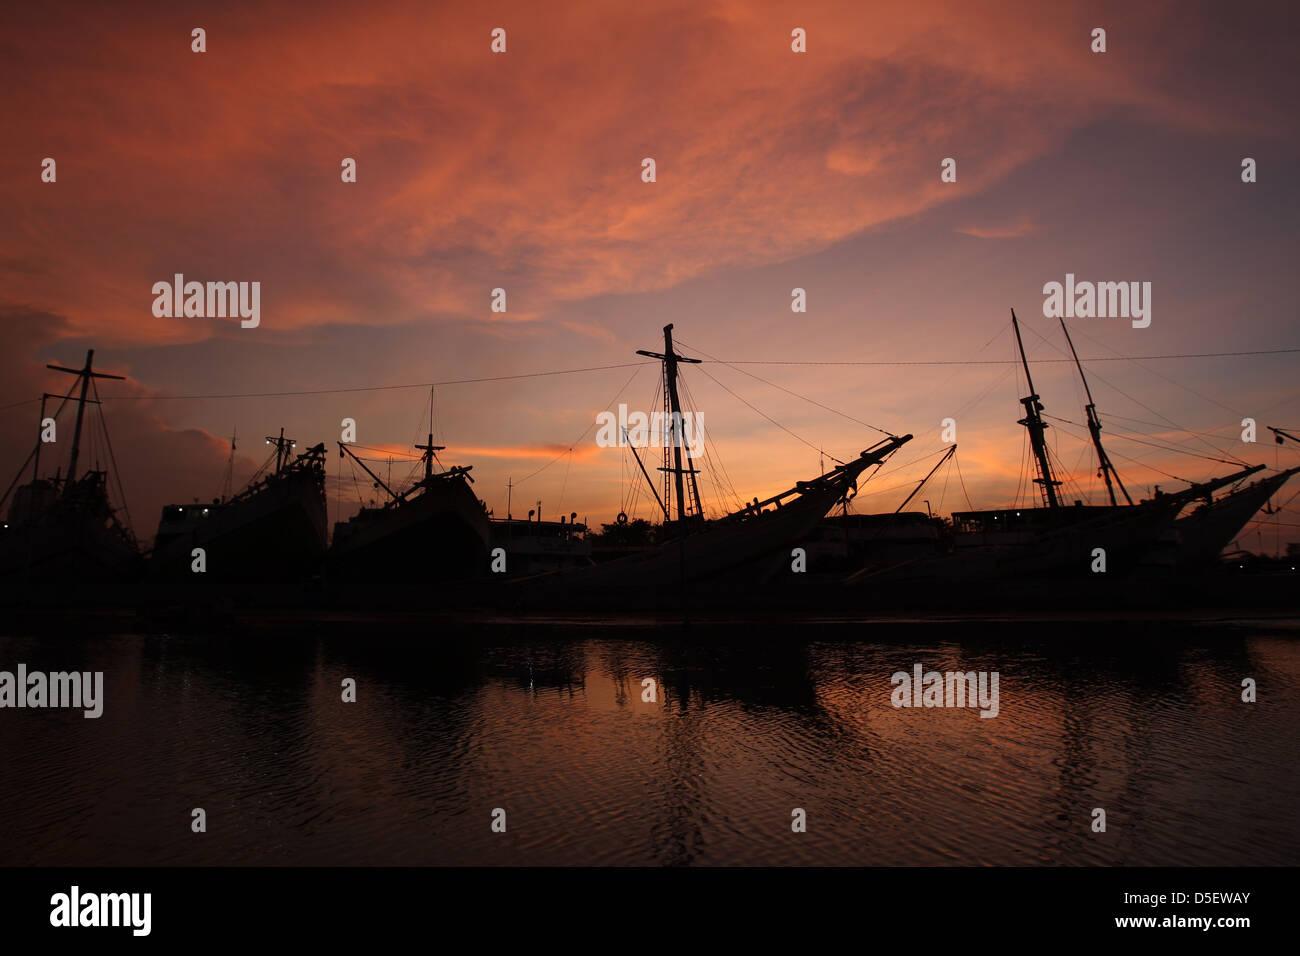 Phinisi at Sunda Kelapa Harbor,Jakarta,Indonesia. - Stock Image